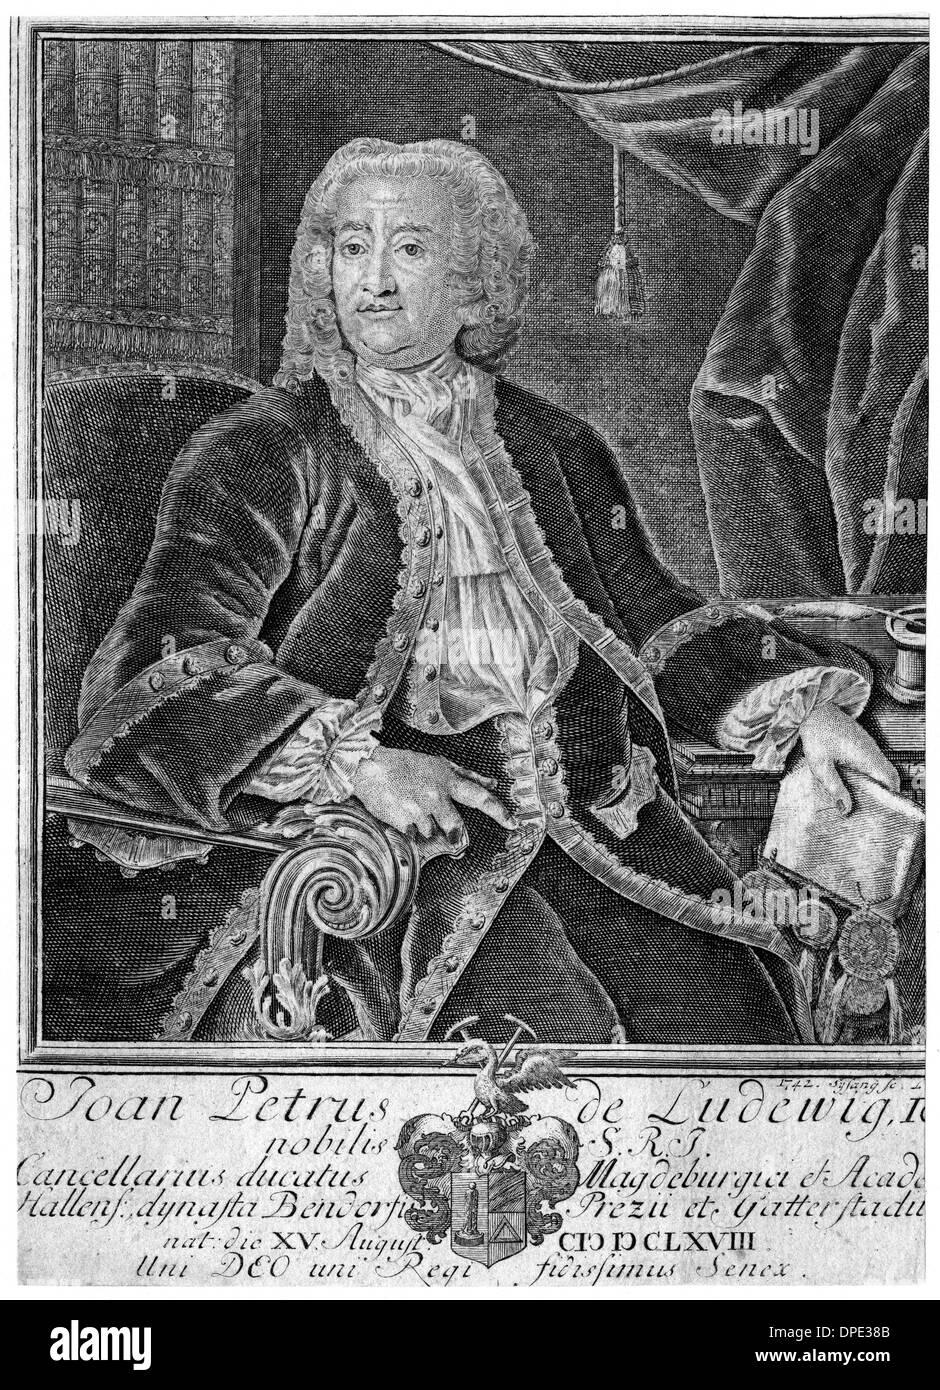 JOHANN PETER LUDWIG 2 - Stock Image